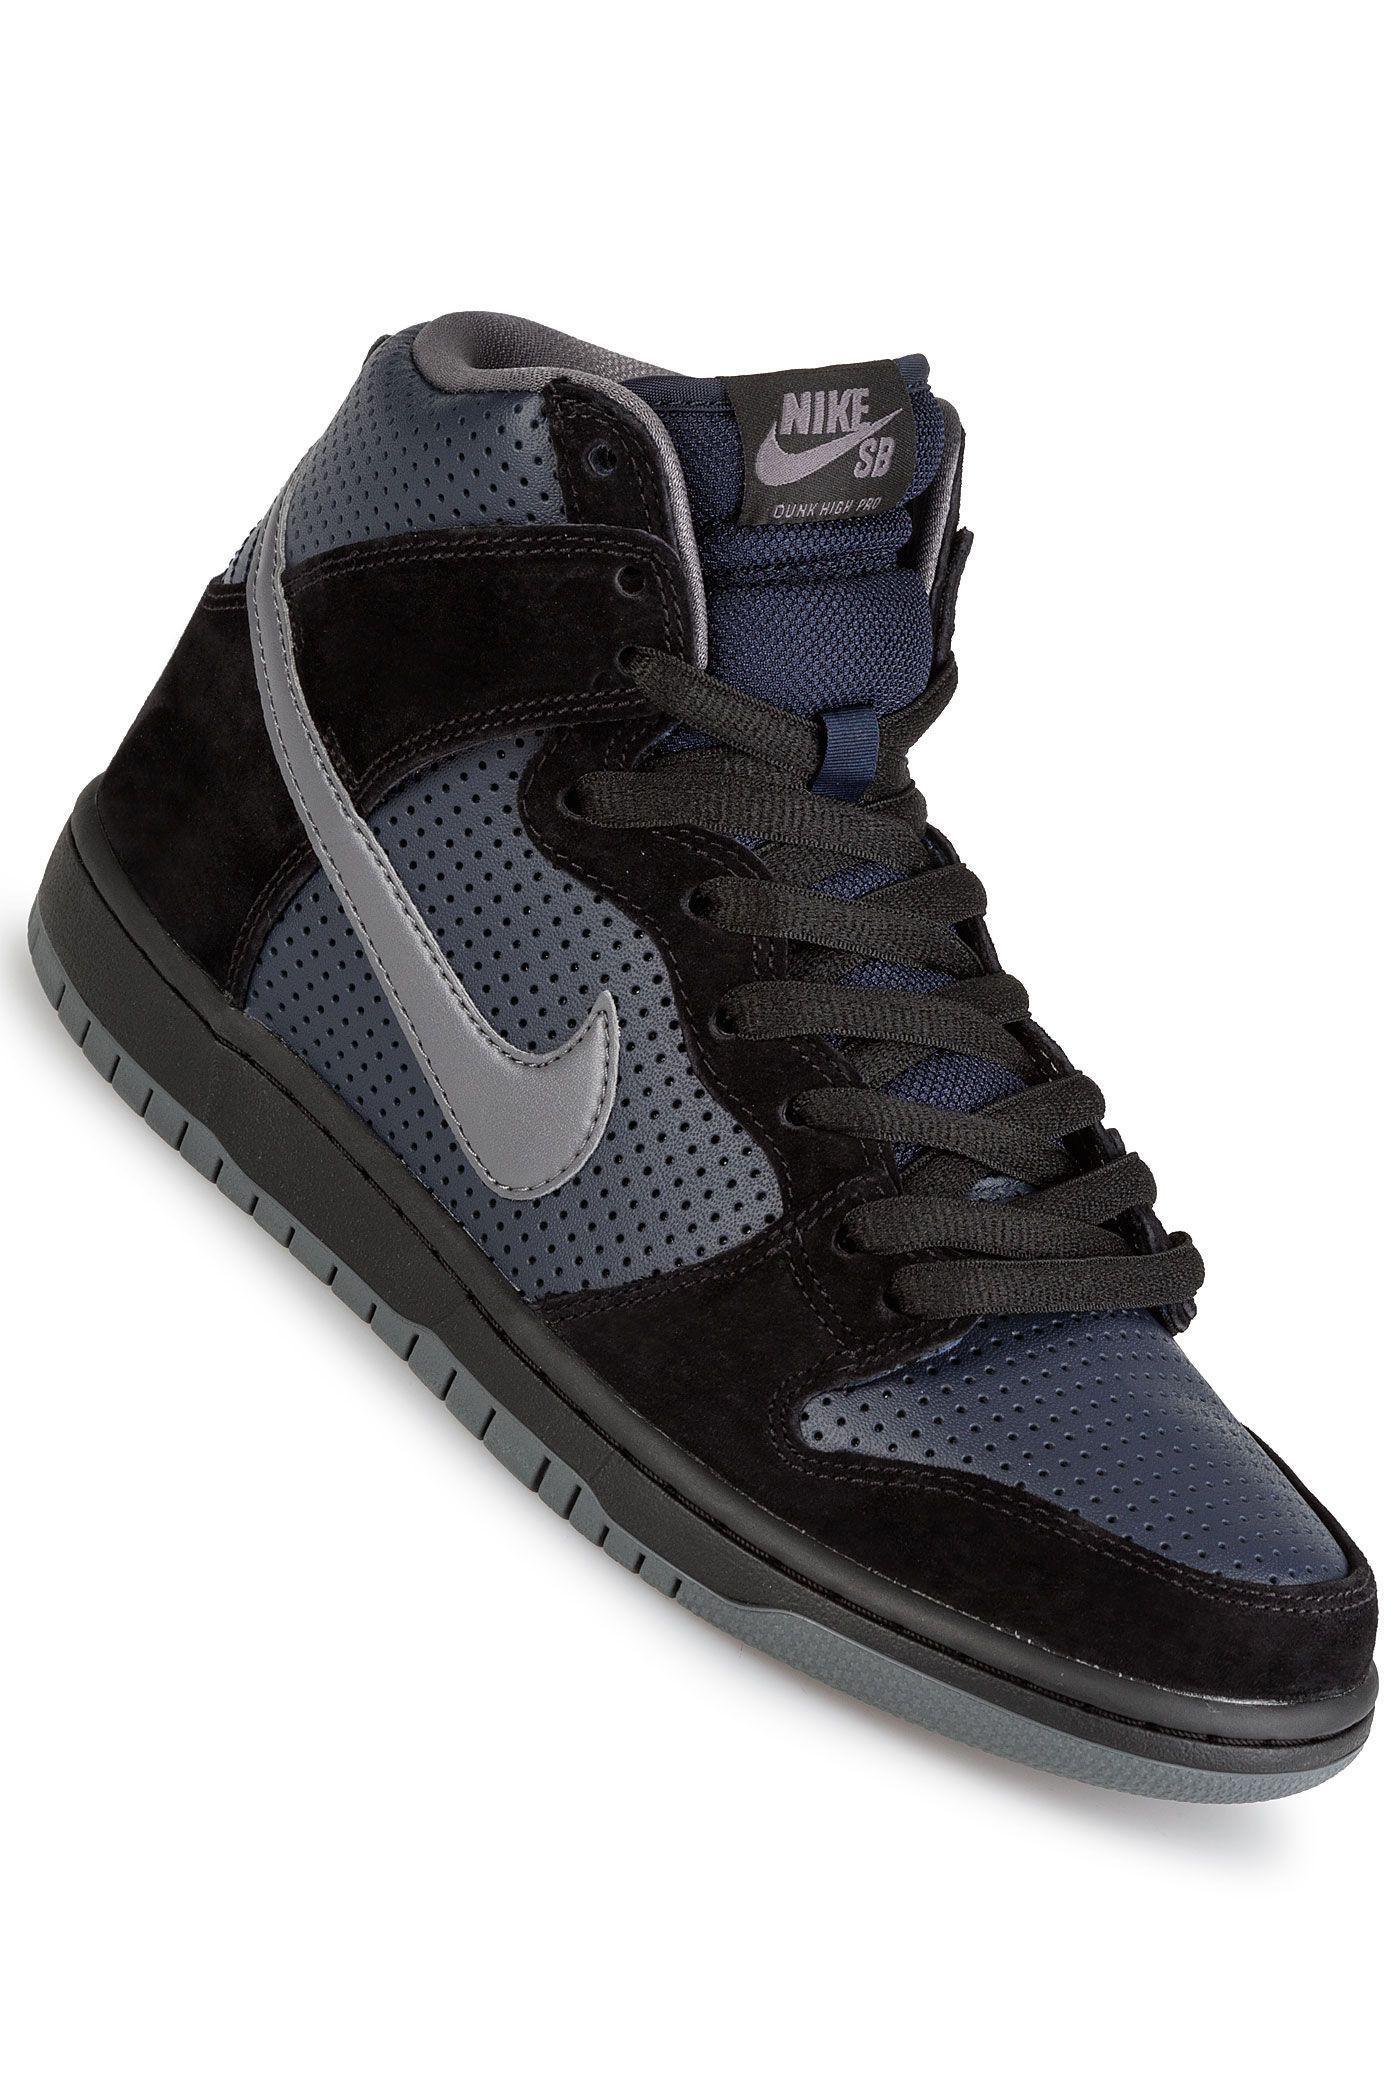 2b0e1e0f77e69 Nike SB Dunk High OG Gino Iannucci QS Schoen (black light graphite)